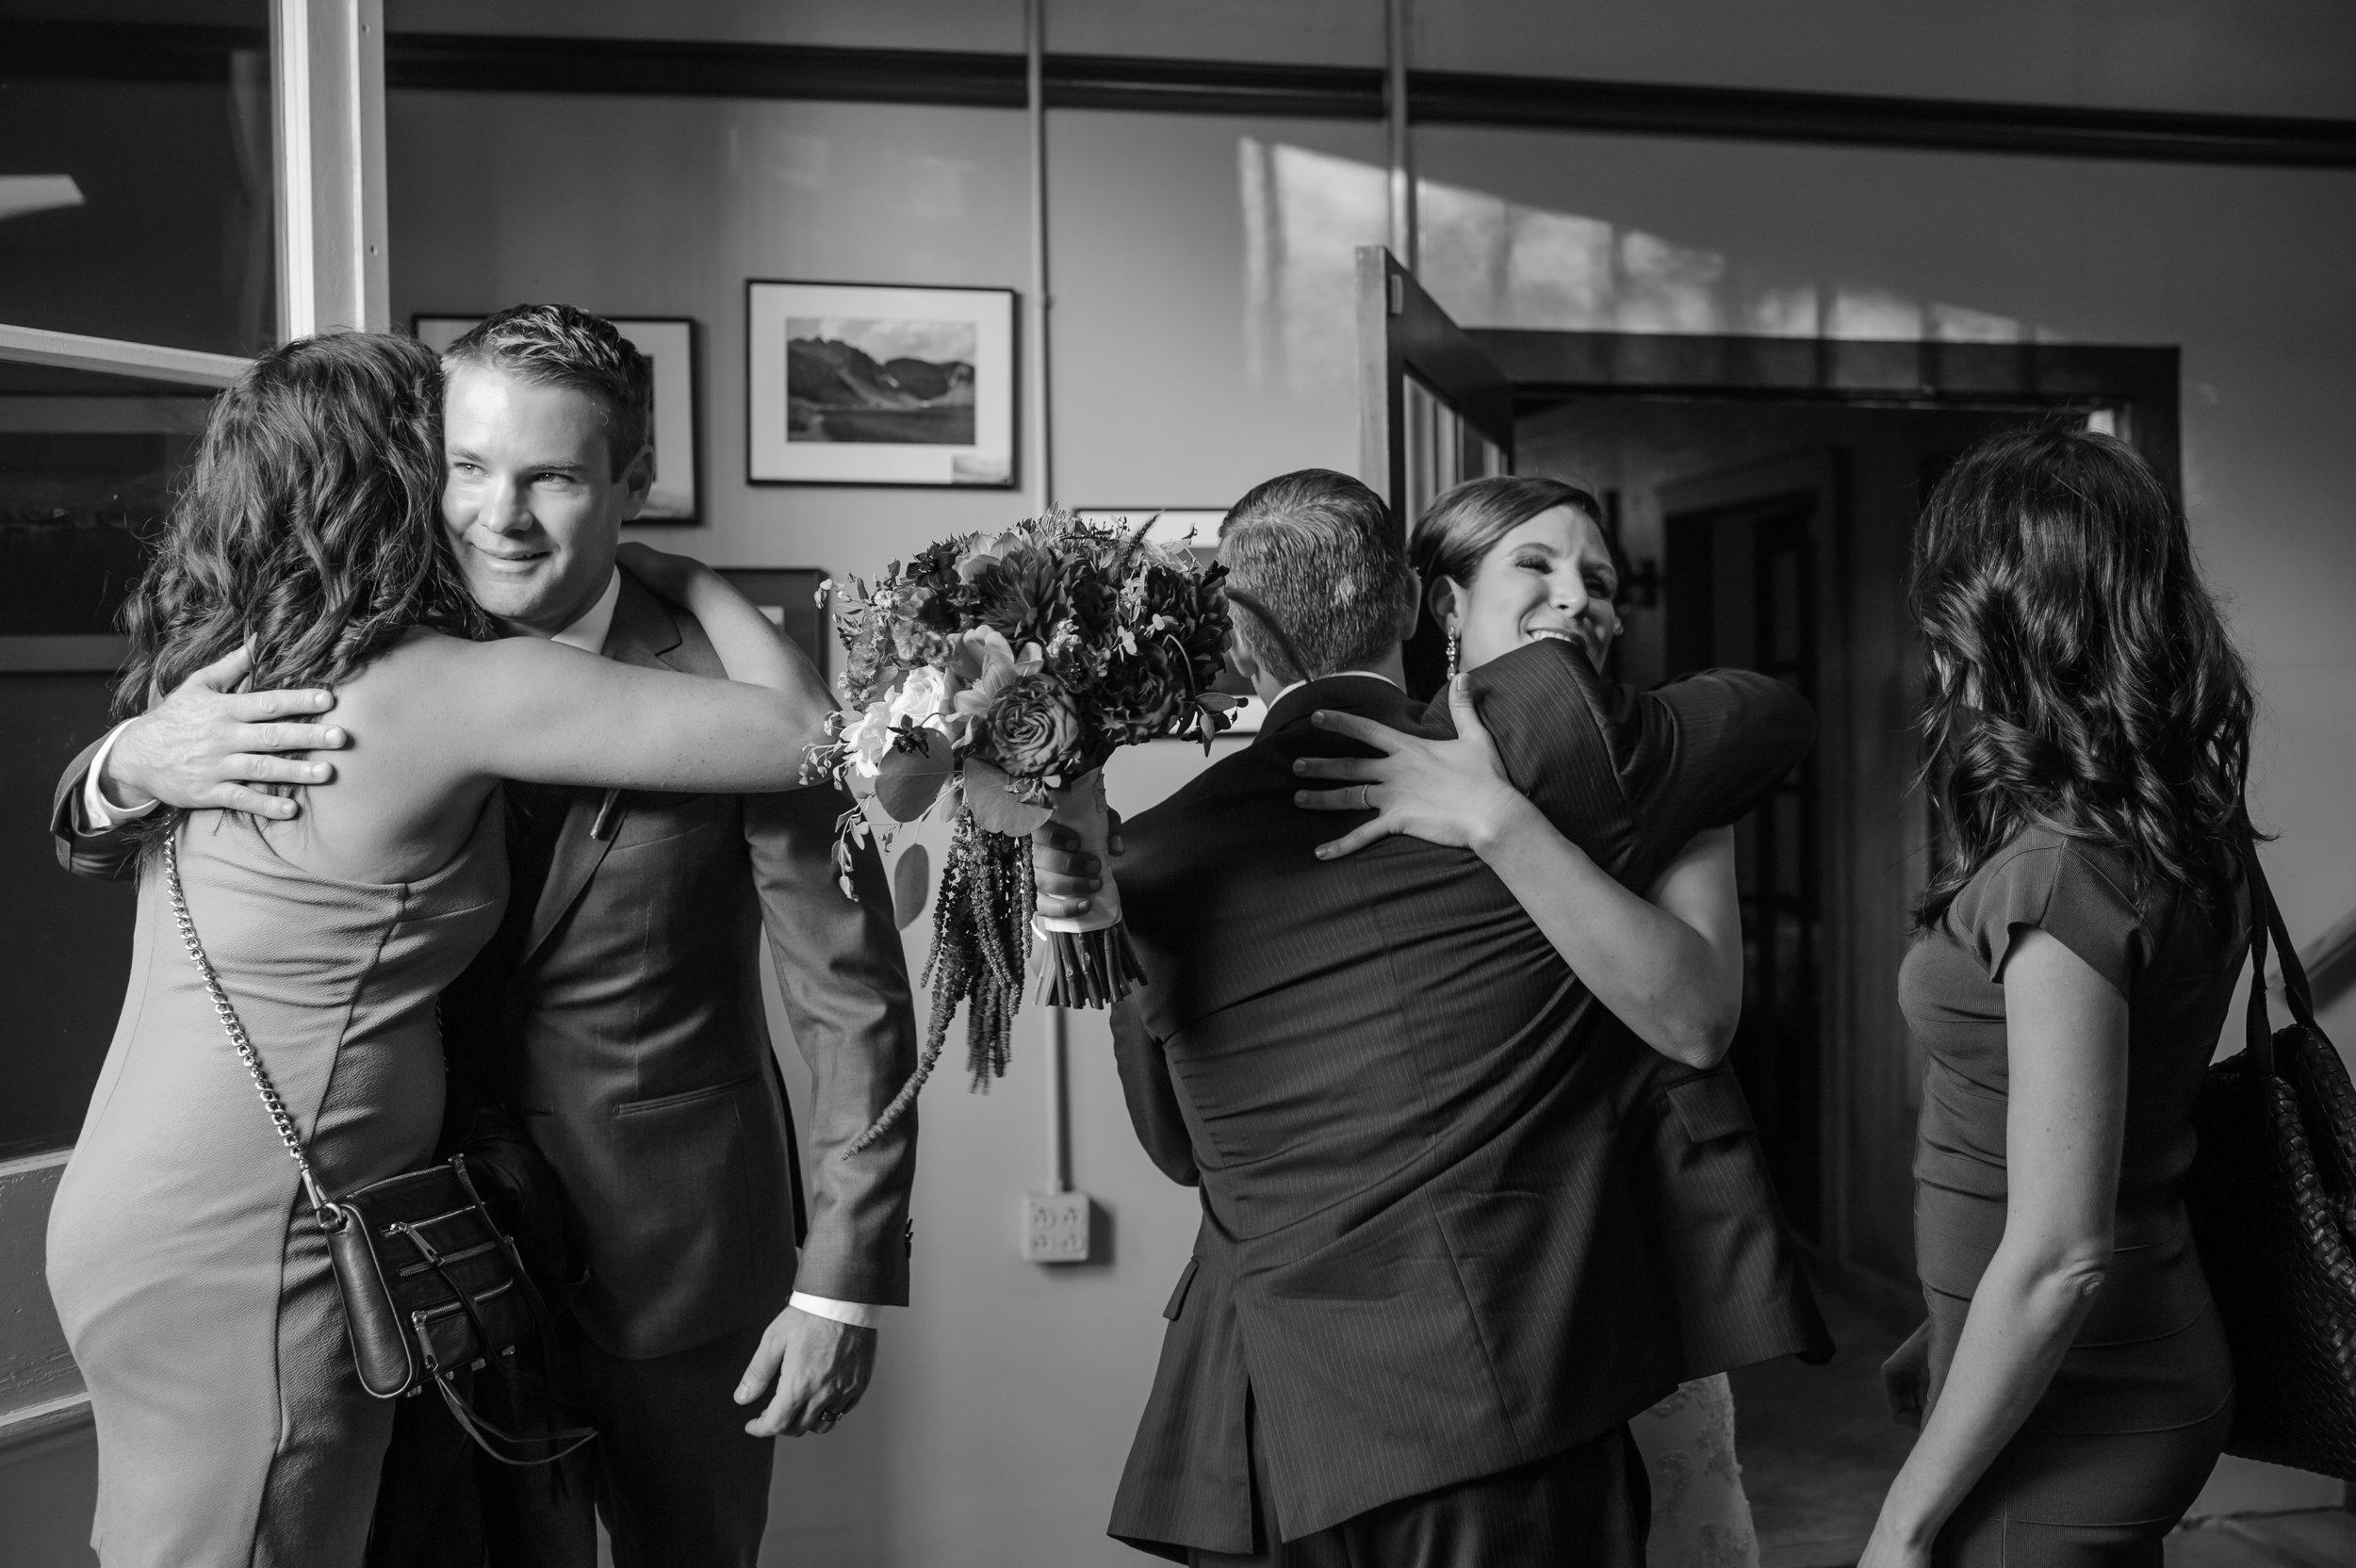 annie-brian-015-antiquite-midtown-sacramento-wedding-photographer-katherine-nicole-photography.JPG